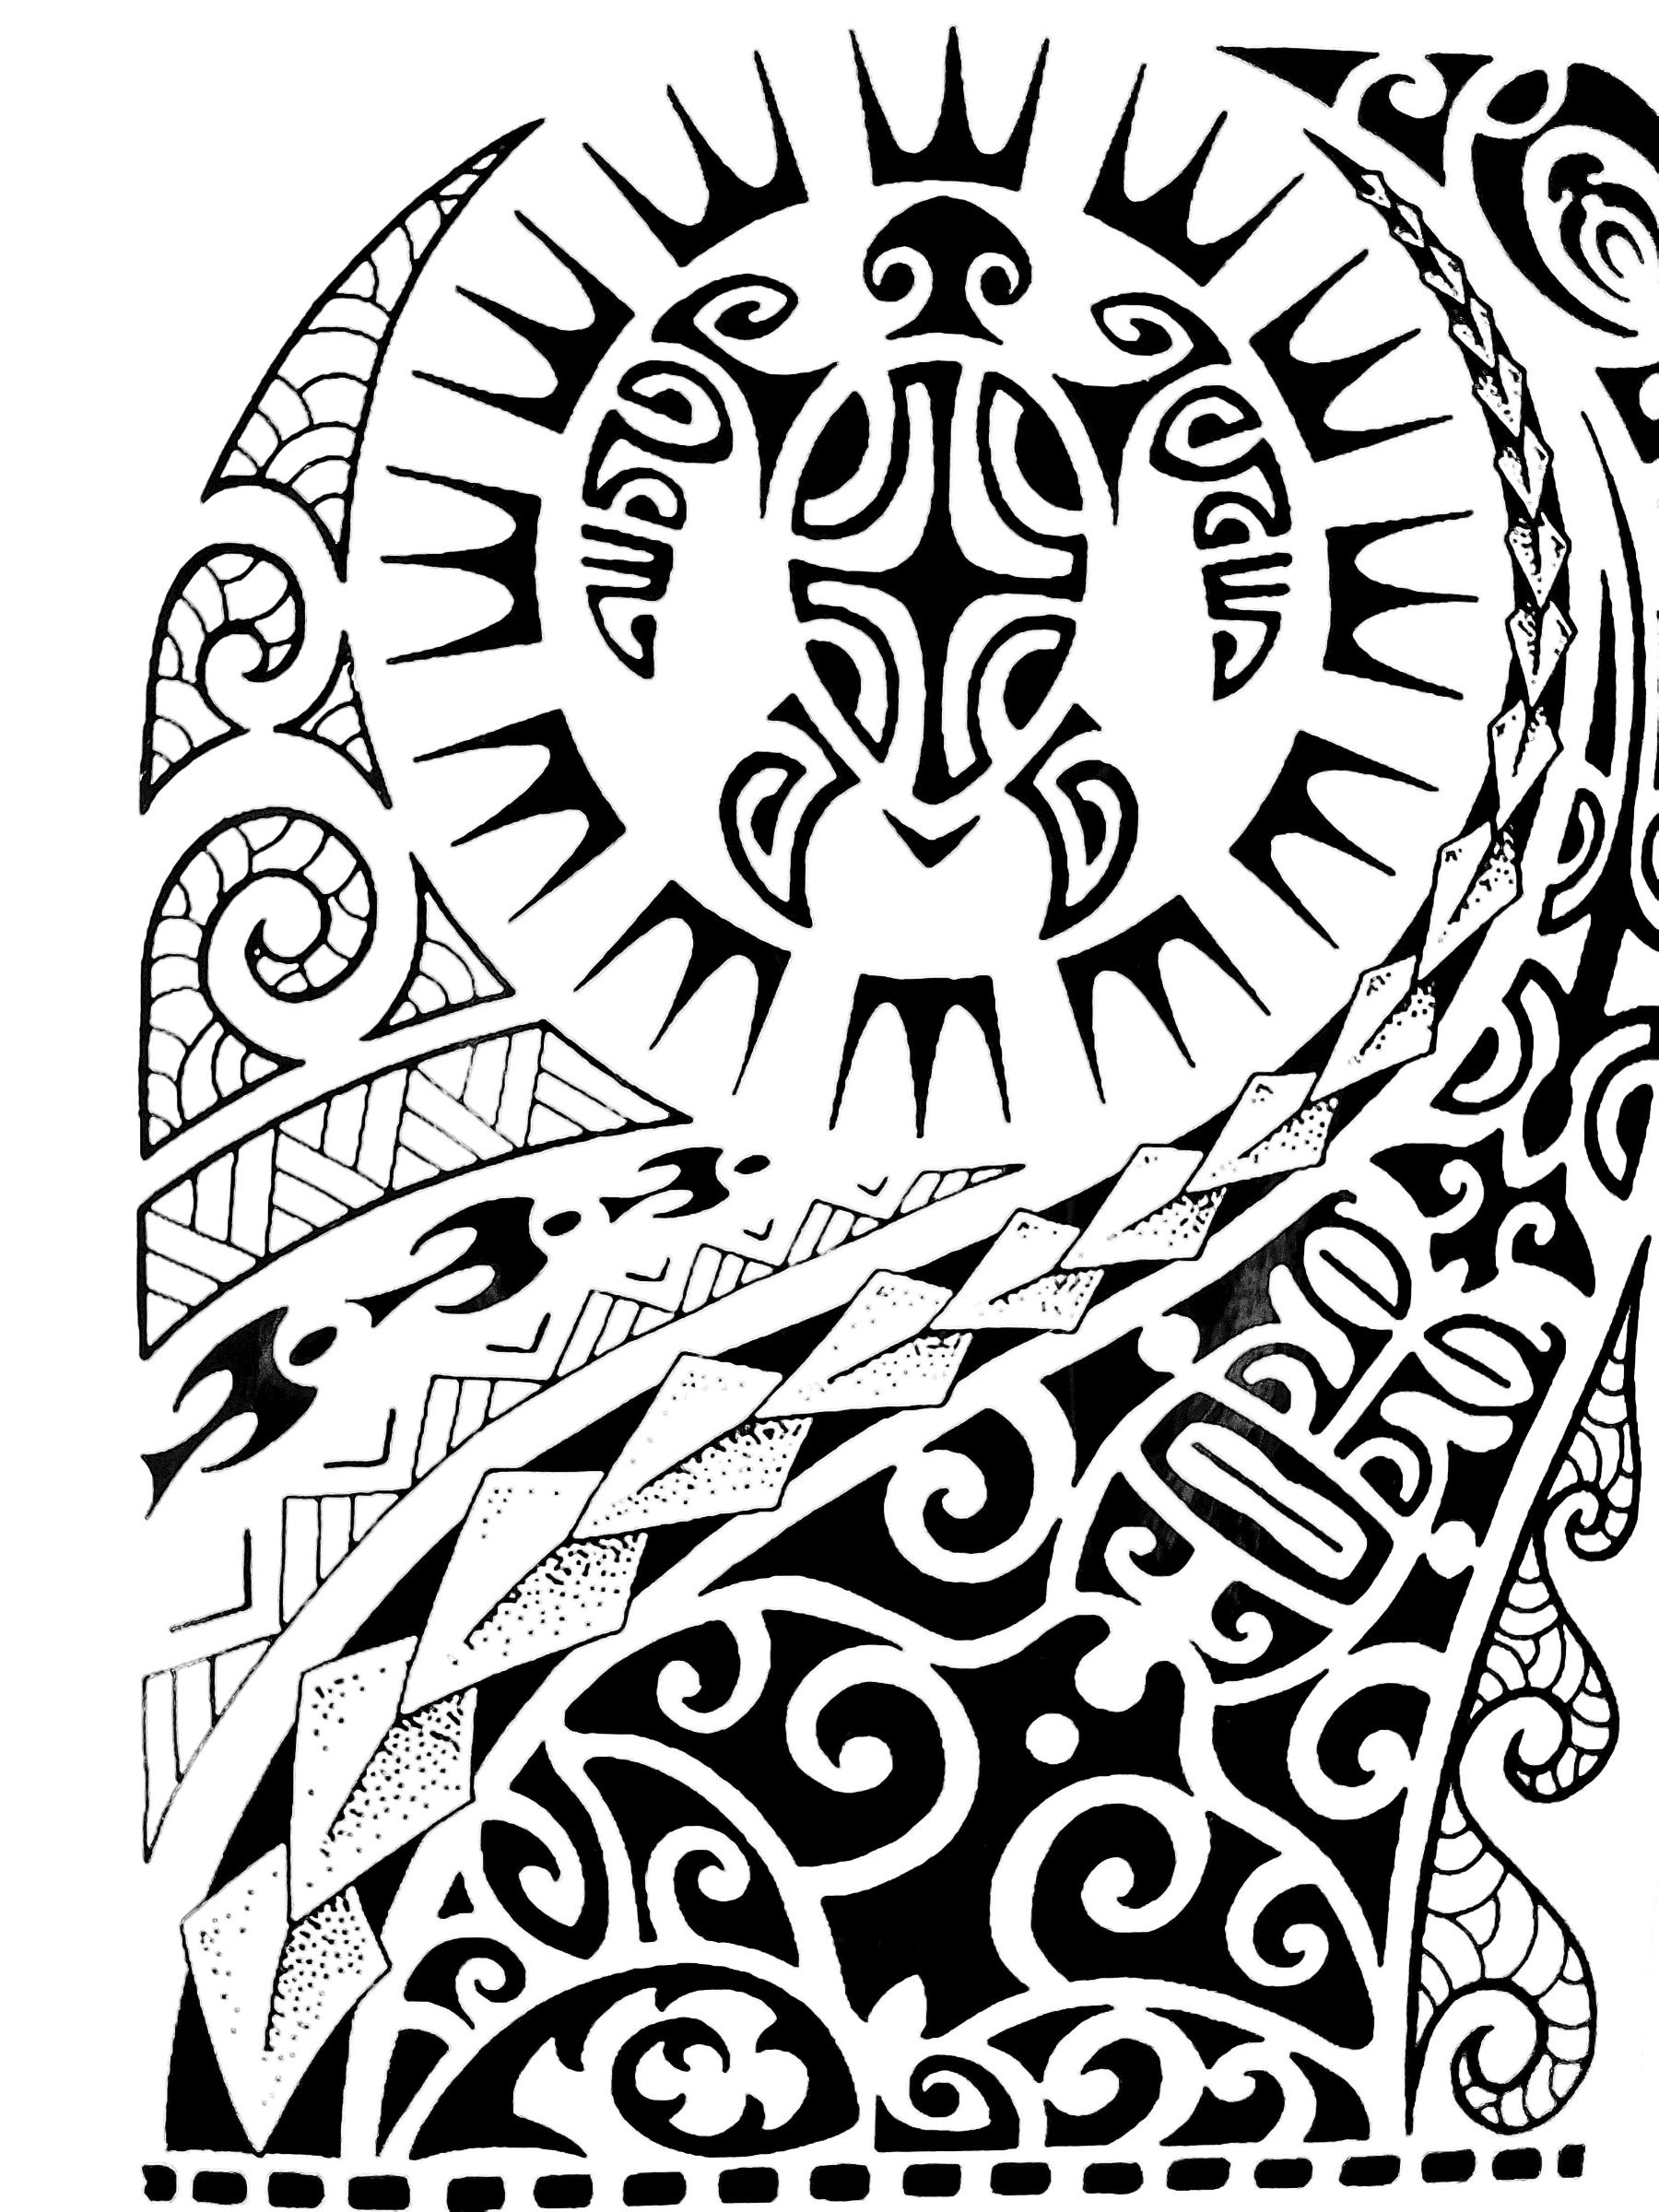 Realistic Large Temporary Tattoo Large Tribal Maui Black Totem Arm Tattoo Marquesantattoos Marquesan Tattoos Polynesian Tattoo Maori Tattoo